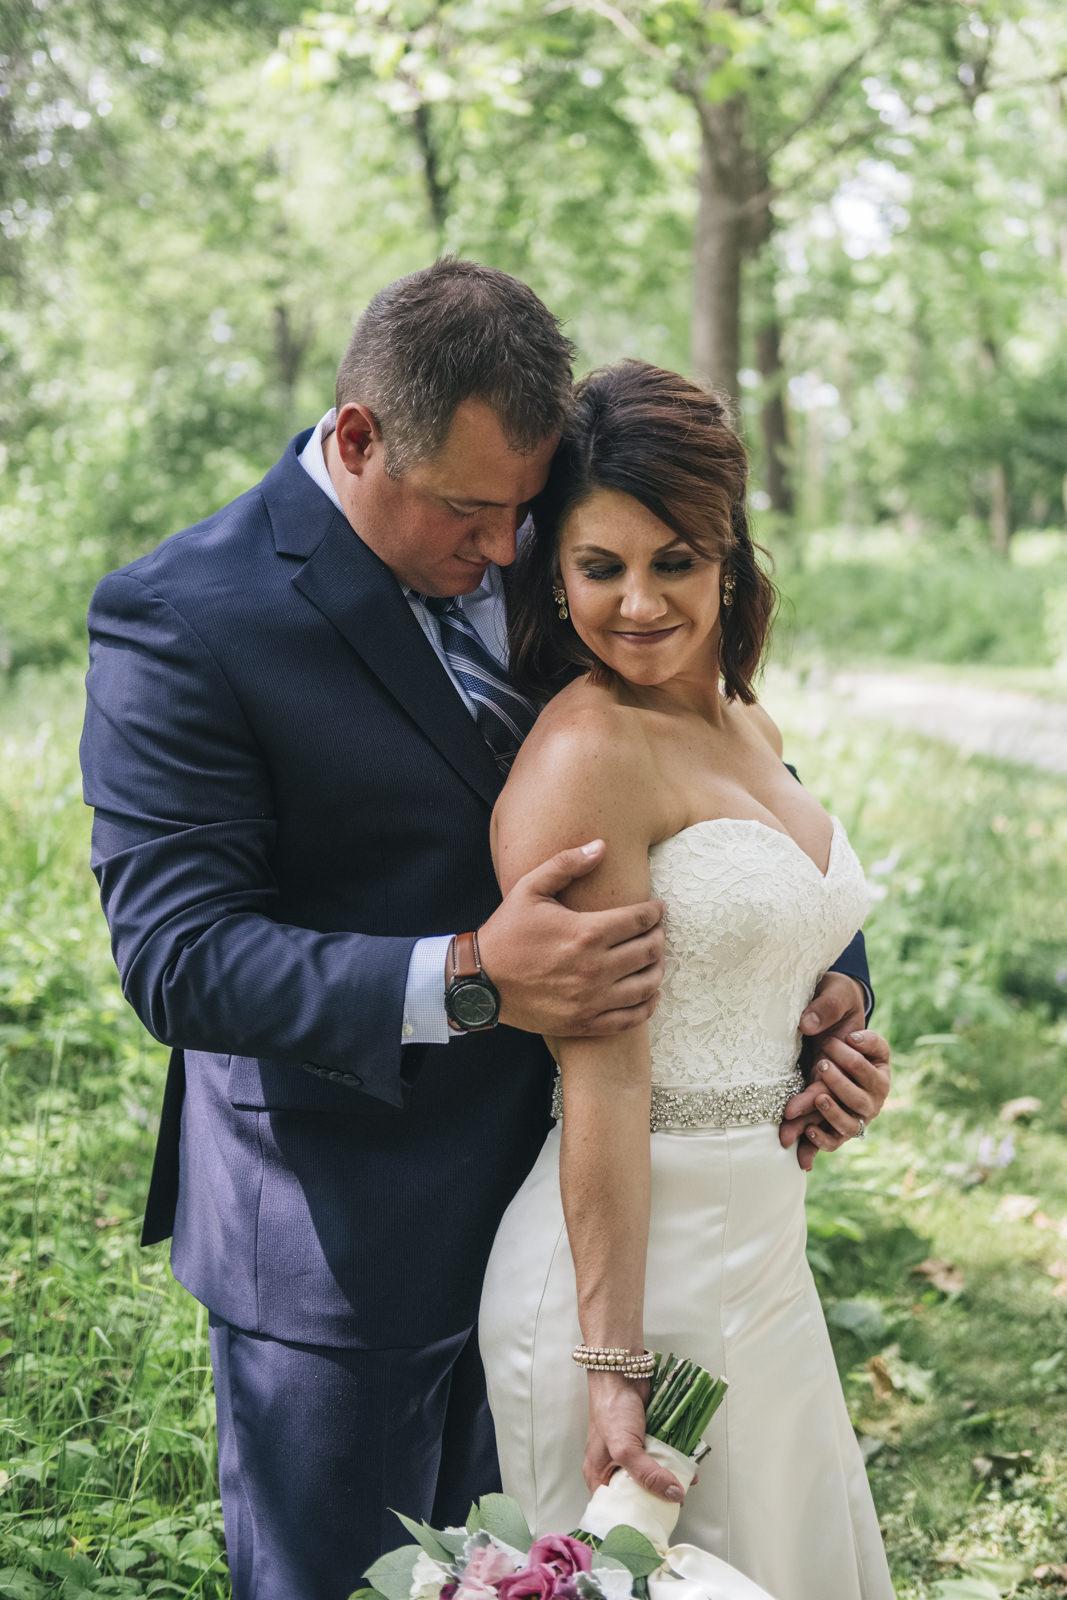 Wedding picture taken at Swan Creek Metropark in Toledo.